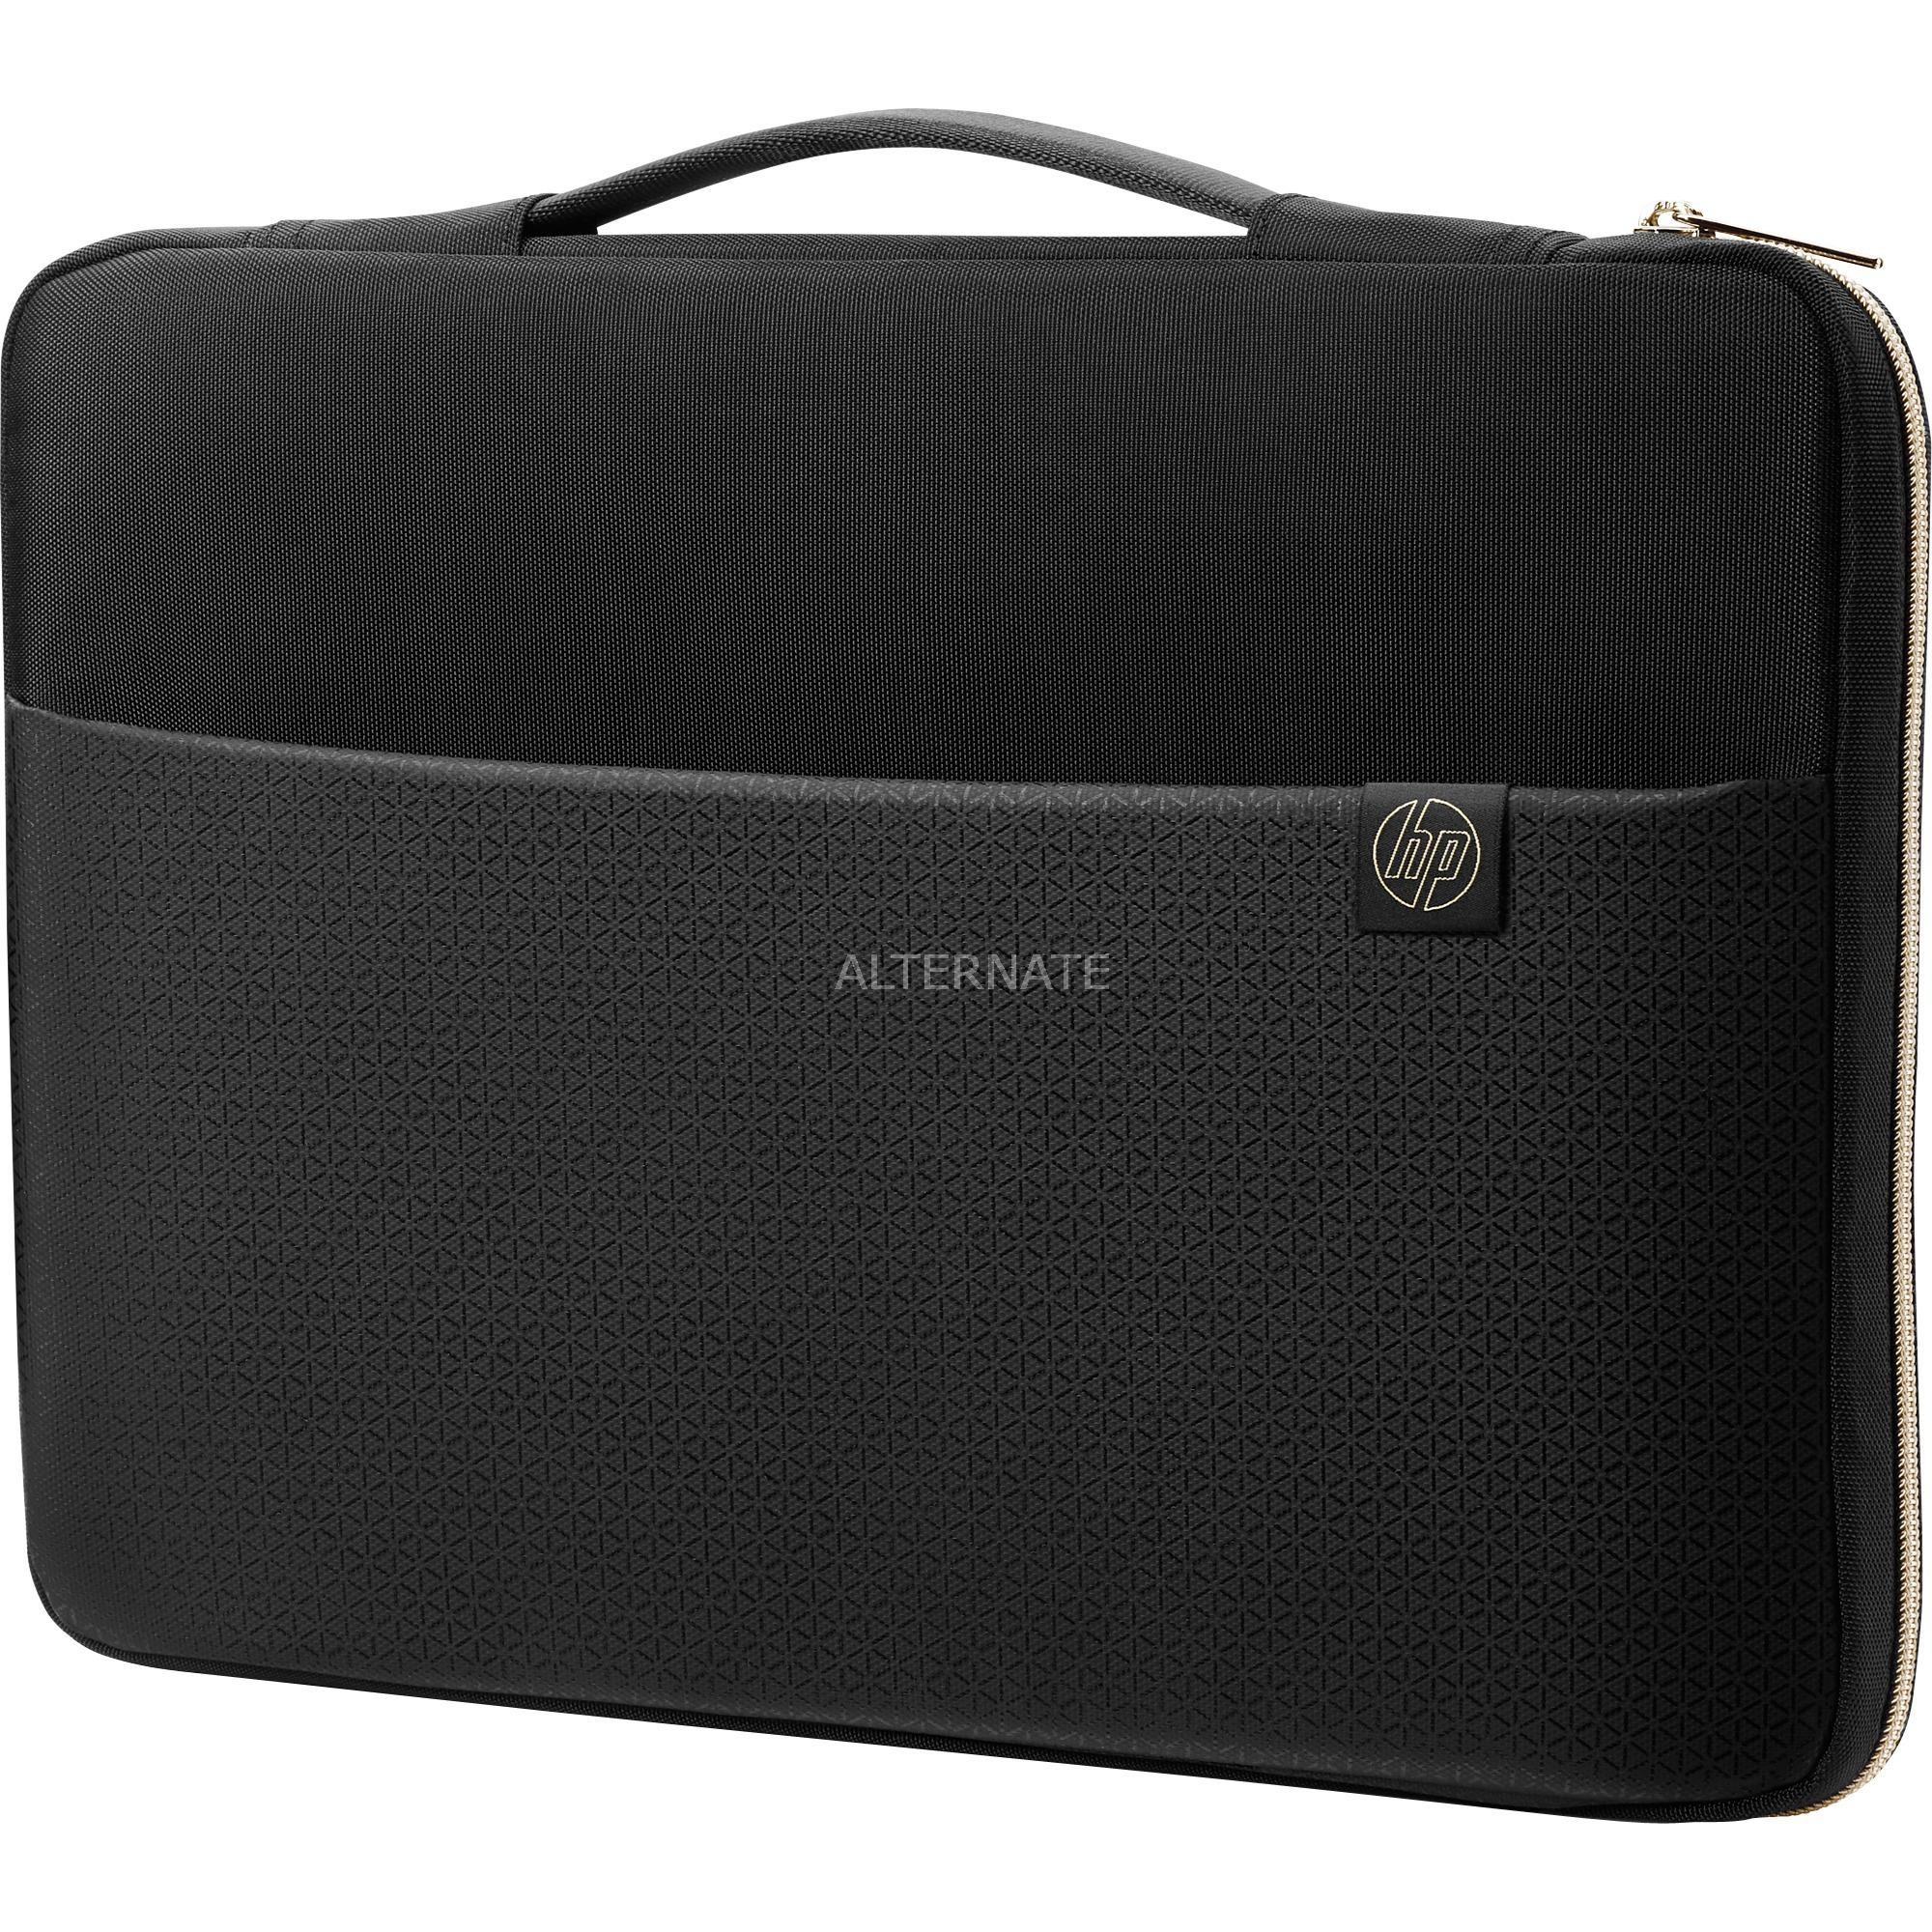 "14"" Carry Sleeve Black/Gold maletines para portátil 35,6 cm (14"") Funda Negro, Oro, Cubierta"